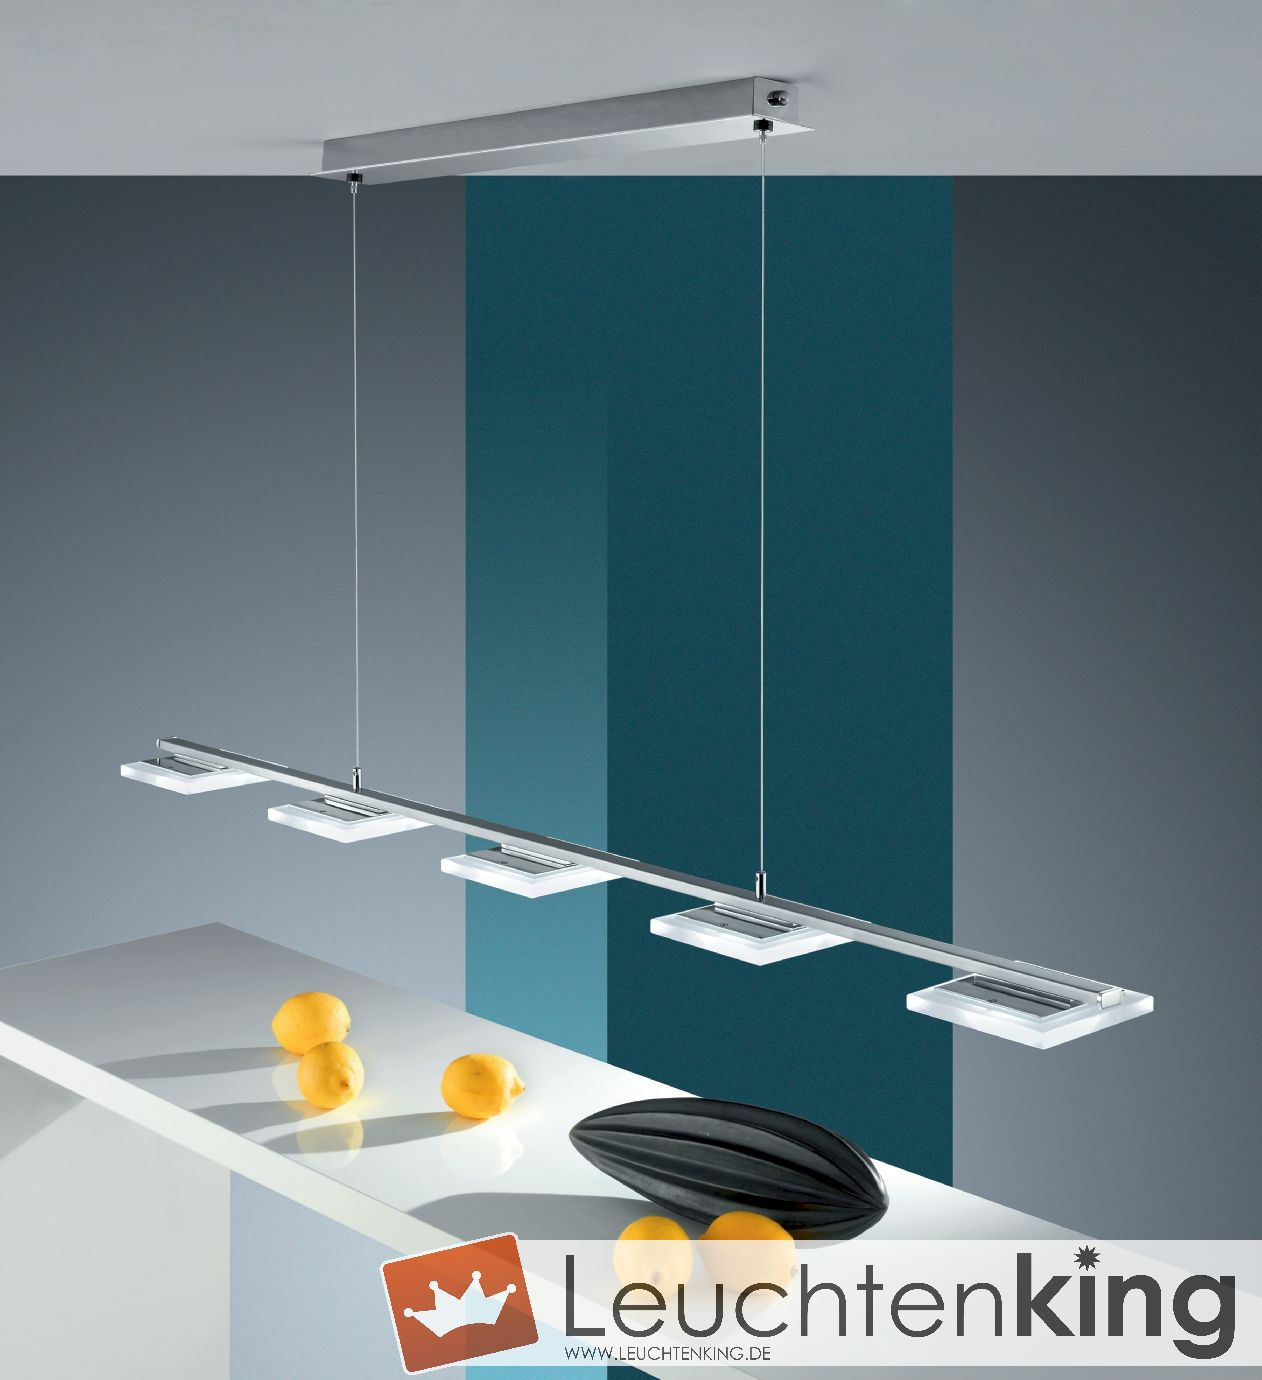 bankamp manhattan pendelleuchte ohne dimmer 2798 5 92 leuchtenking. Black Bedroom Furniture Sets. Home Design Ideas